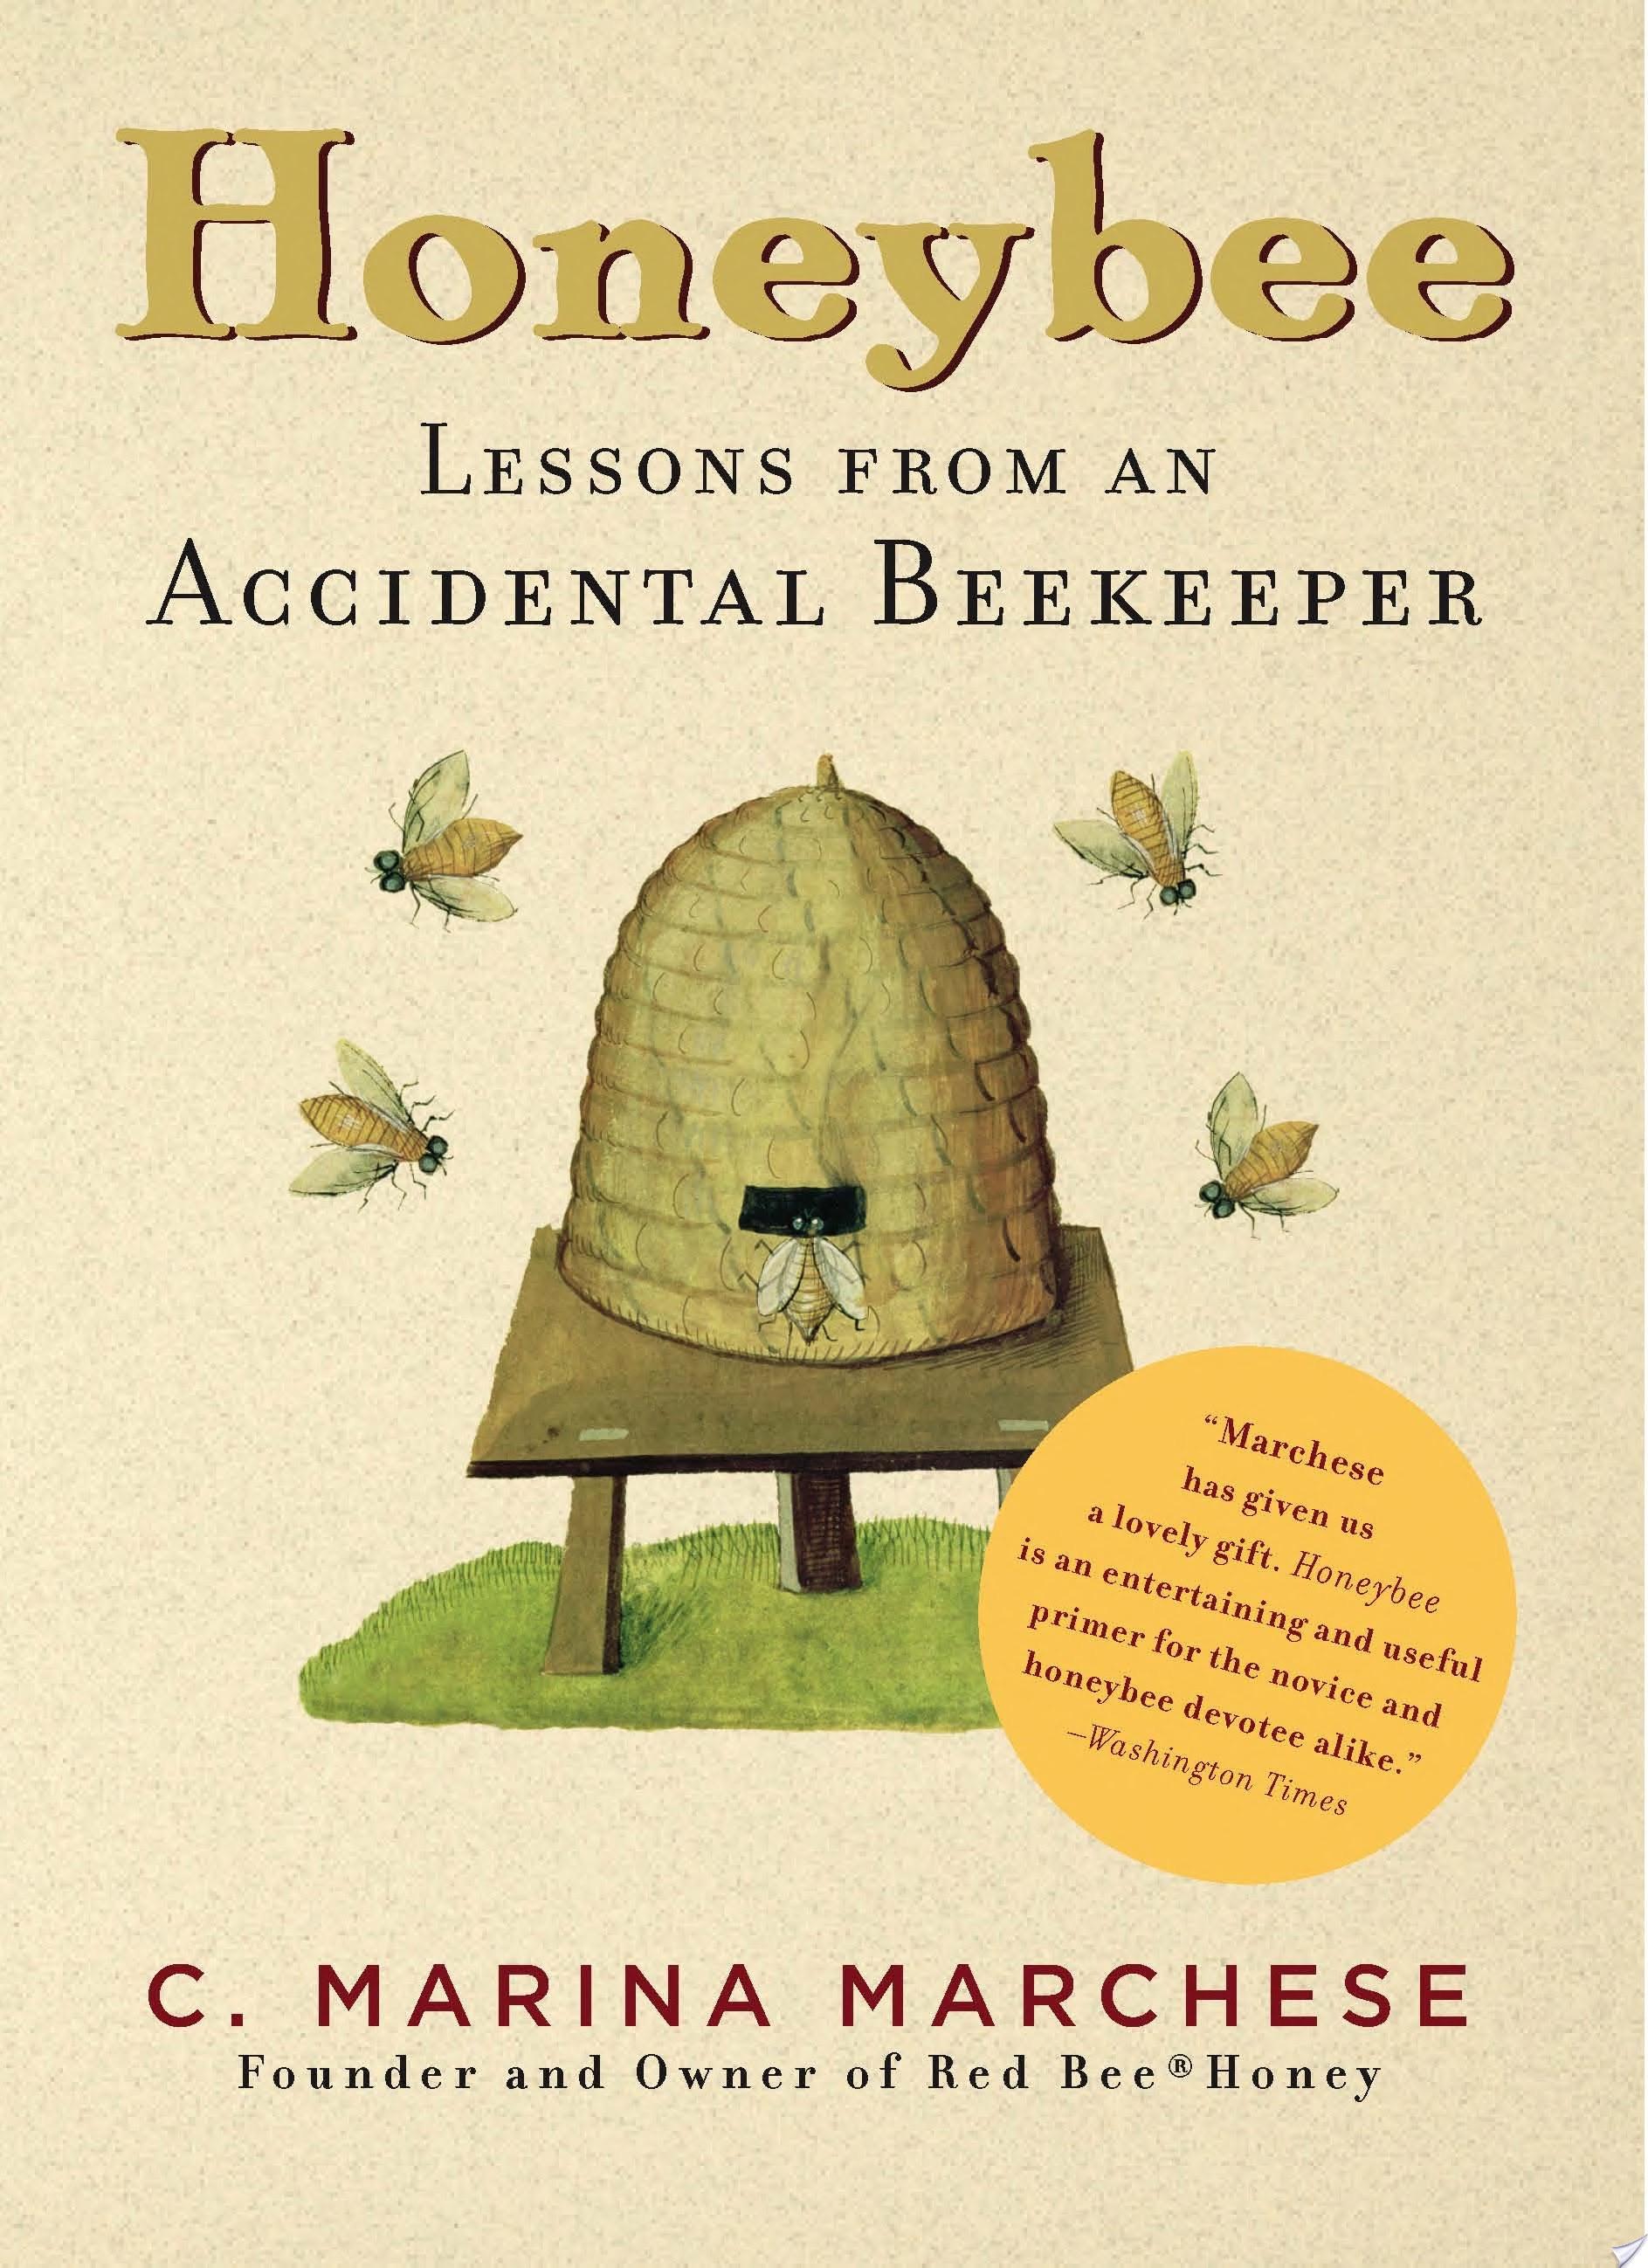 Honeybee Lessons.jpg